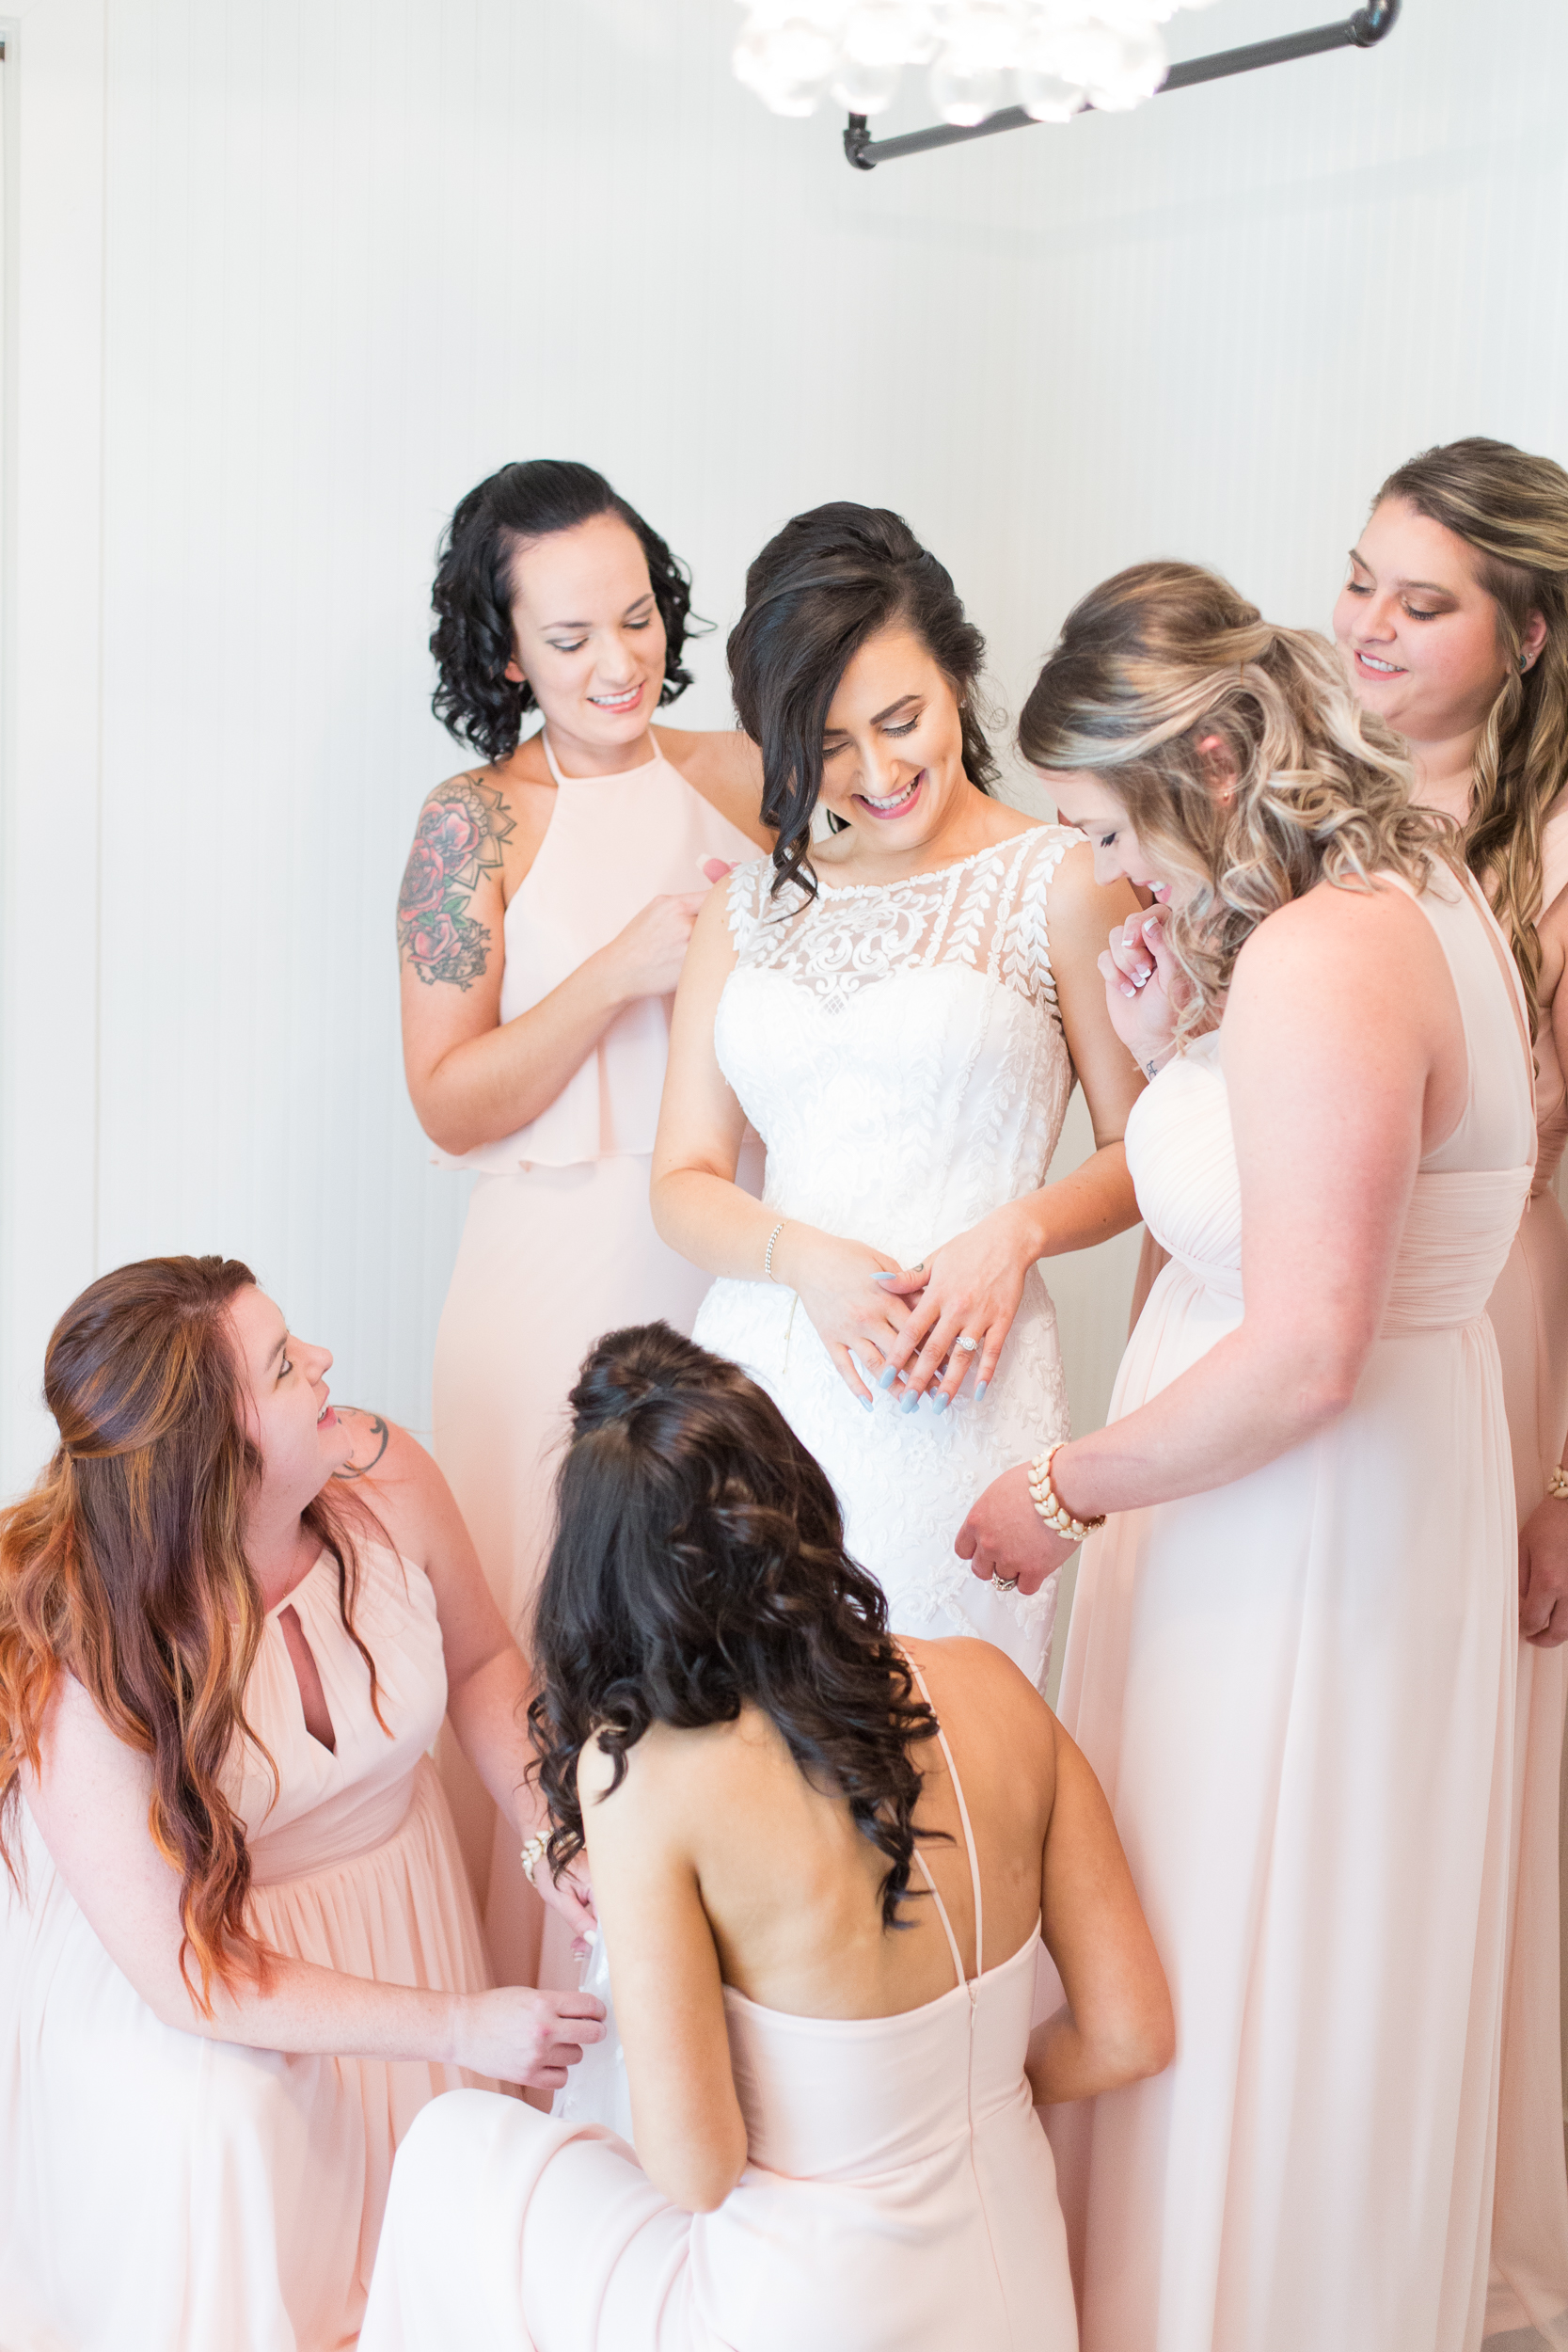 Zihlman-East TX Wedding_Kelsie Hendricks Photography_The Folmar Tyler Texas-58.jpg